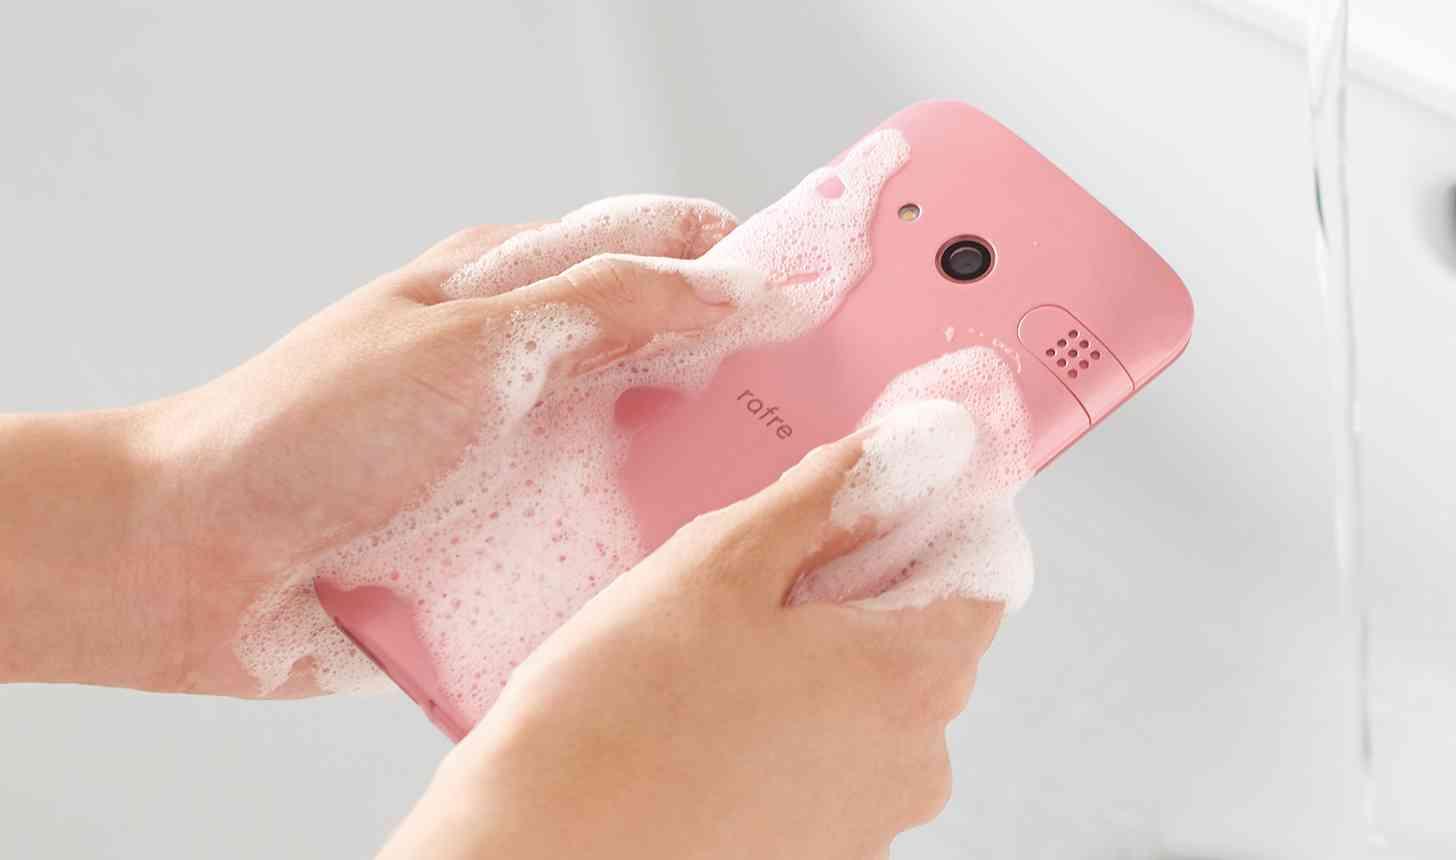 kyocera shower phone